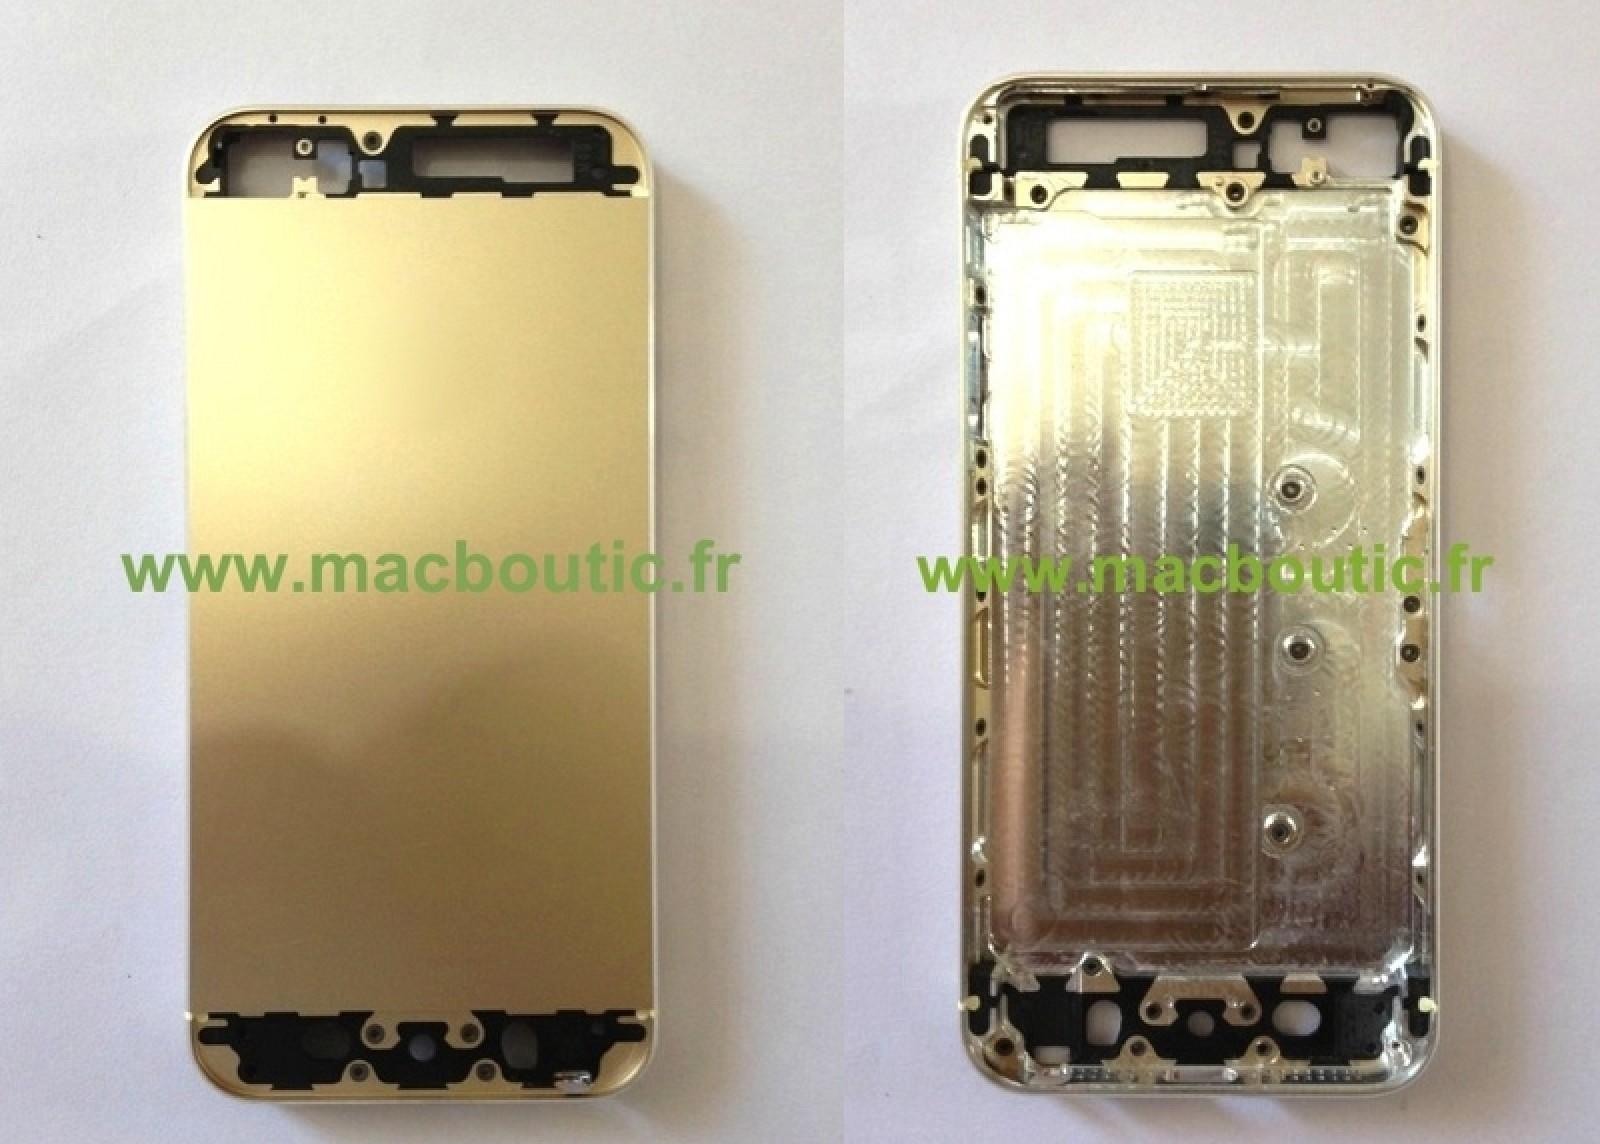 iphone 5s gold leak. iphone 5s gold leak 0